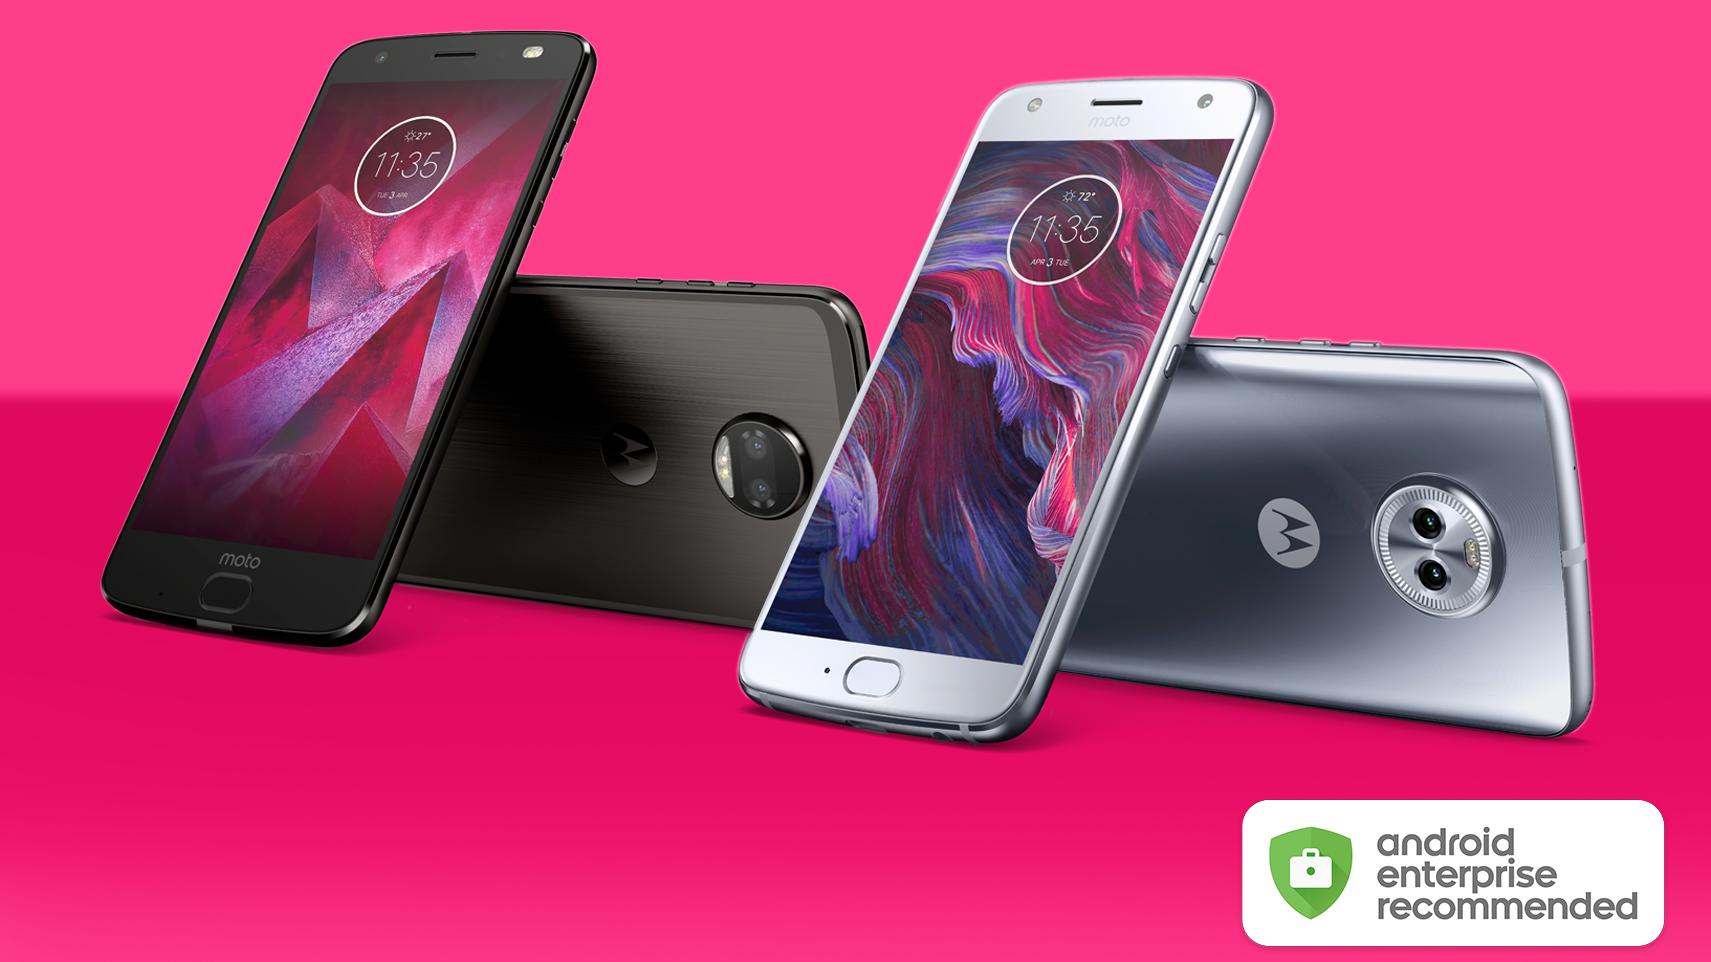 Motorola scelta da Google per Android Enterprise Recommended thumbnail